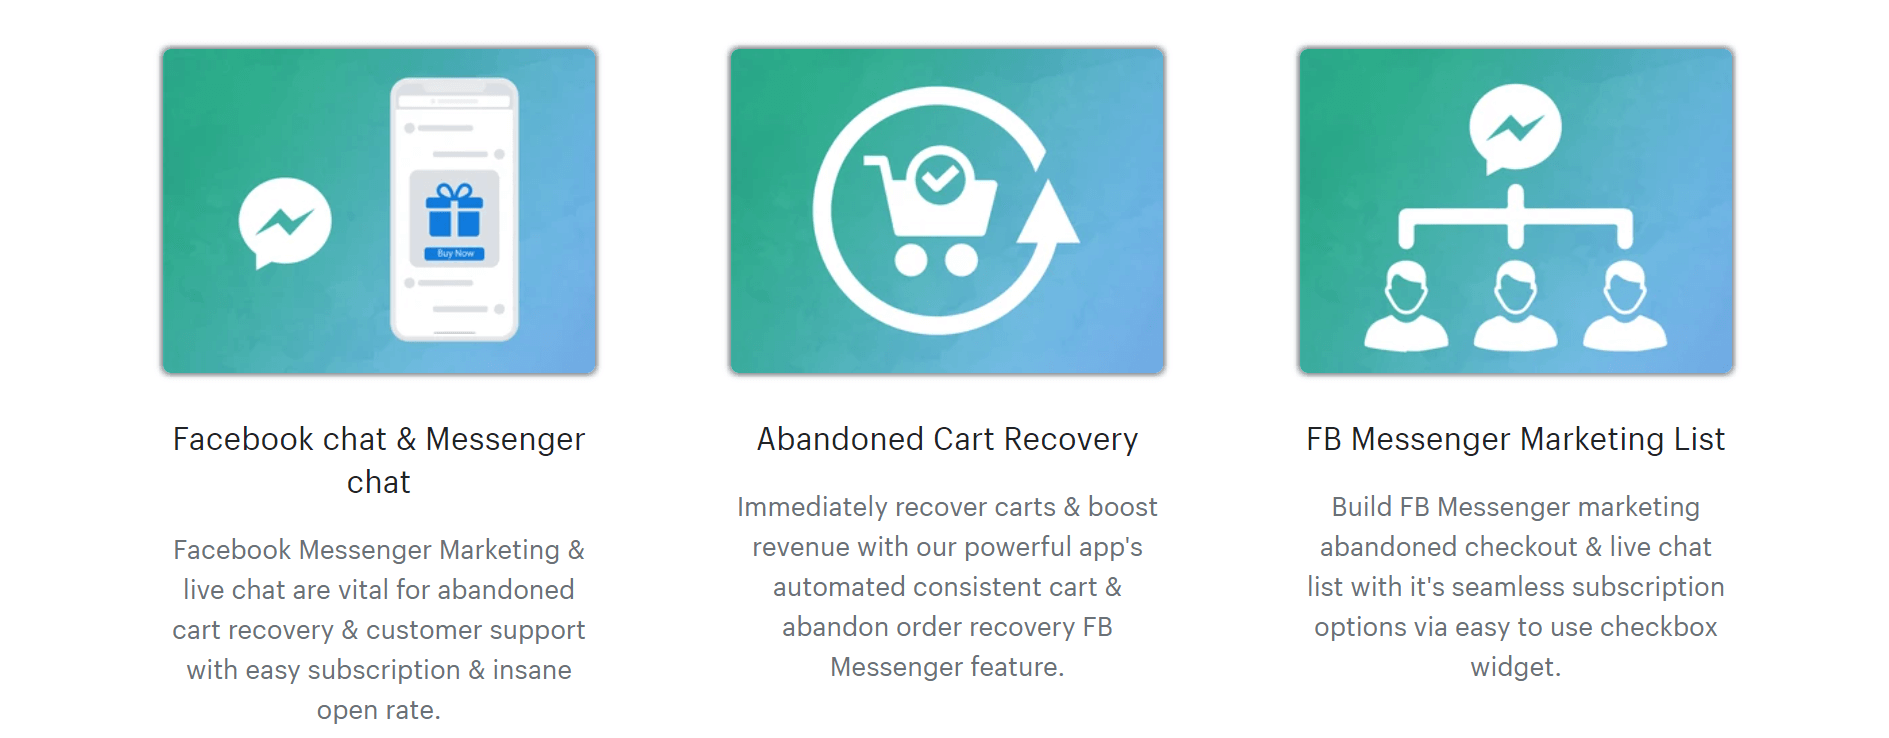 Abandoned Cart FB Chat app benefits